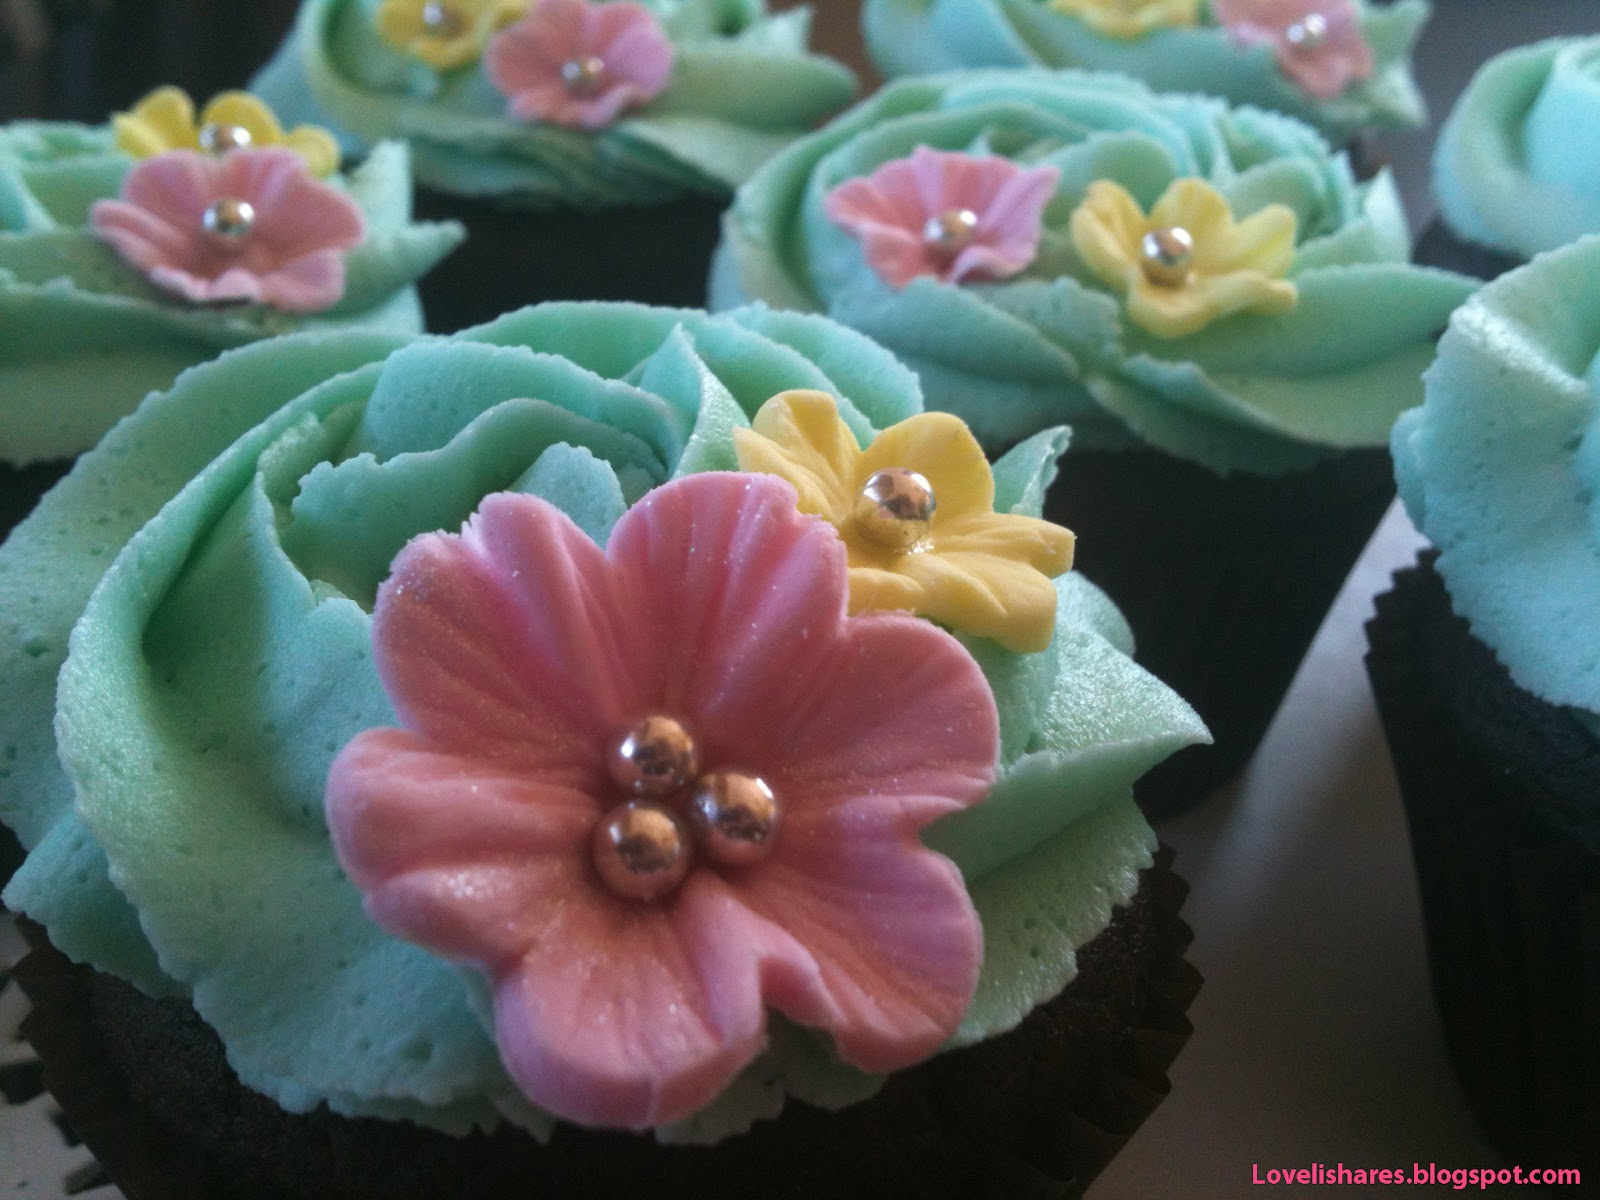 http://2.bp.blogspot.com/-jtkmuy8WGIs/T7DATctkwrI/AAAAAAAAAgQ/IBdnYDWYDvQ/s1600/green+buttercream-cupcakes.jpg